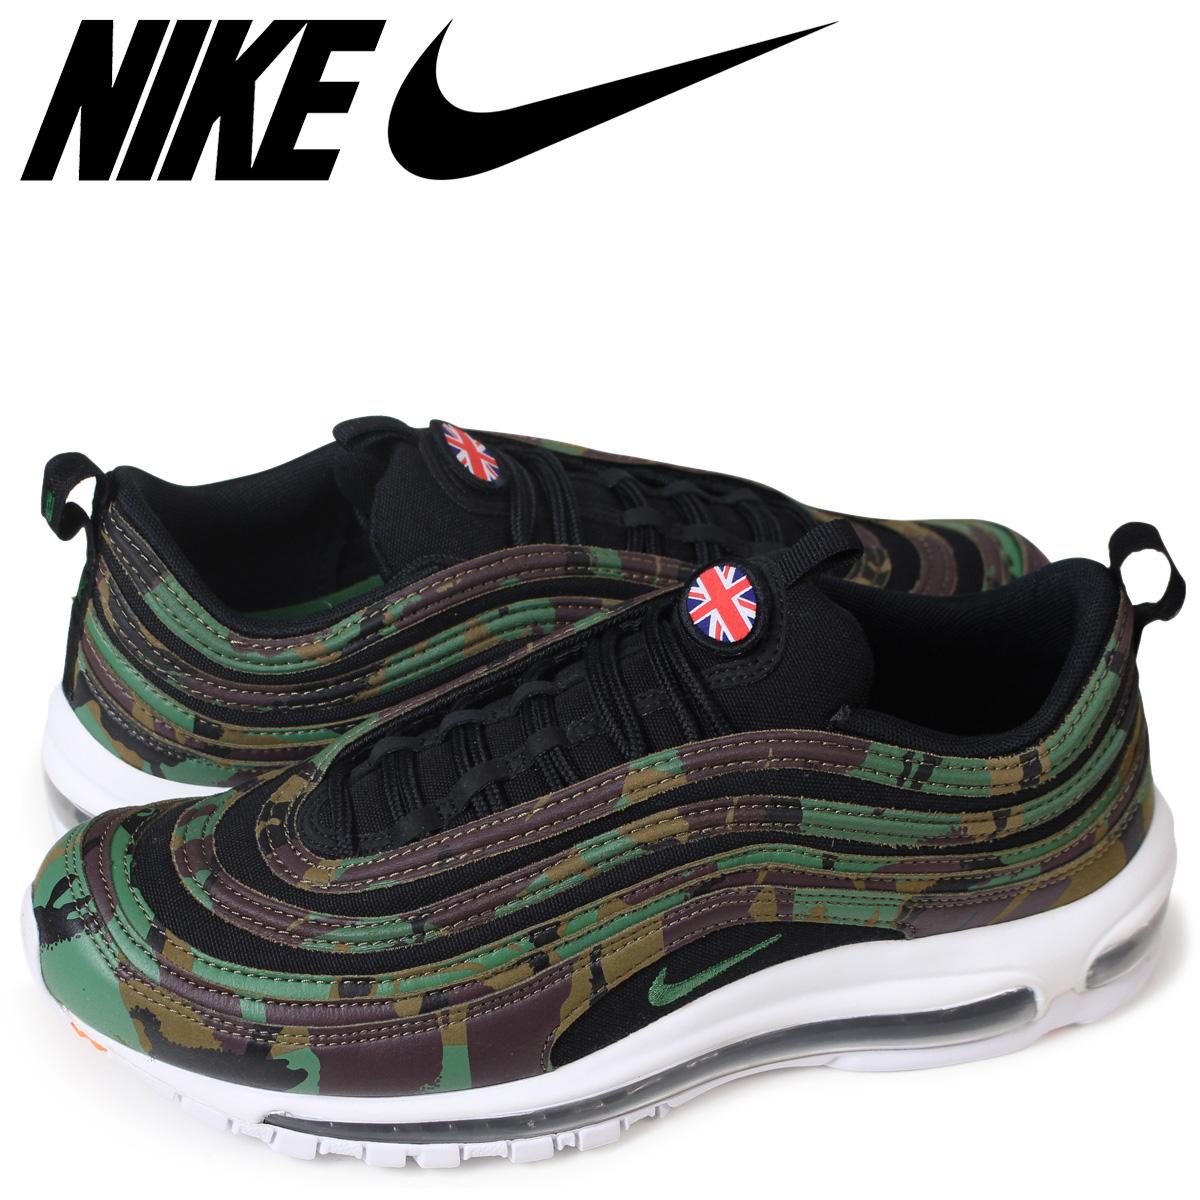 NIKE AIR MAX 97 OG UK CAMO Kie Ney AMAX 97 sneakers men AJ2614 201 black